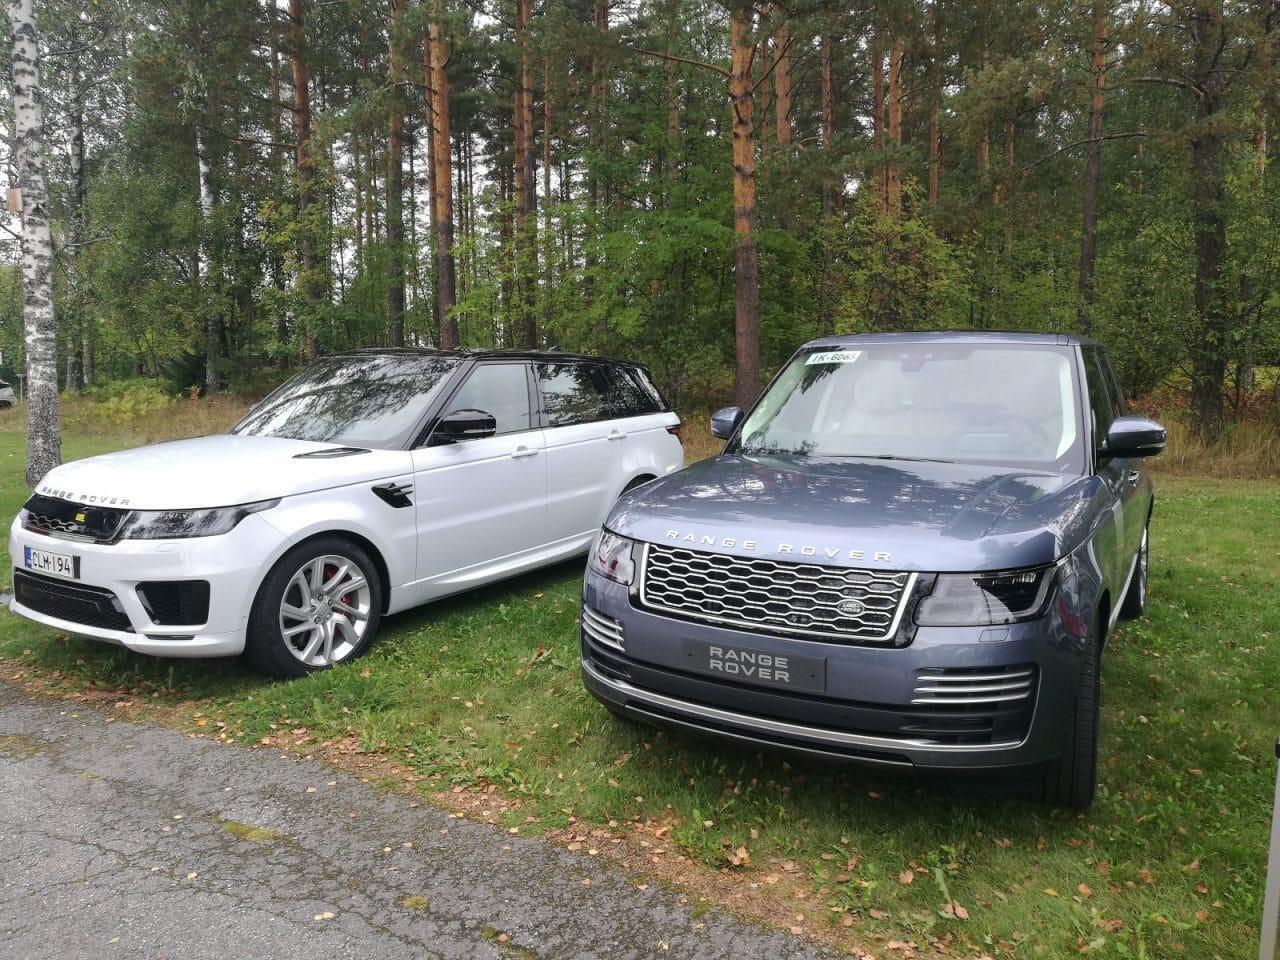 Jokamies-Tesla-Club-Finland-Långvik-Range-Rover-hybrid